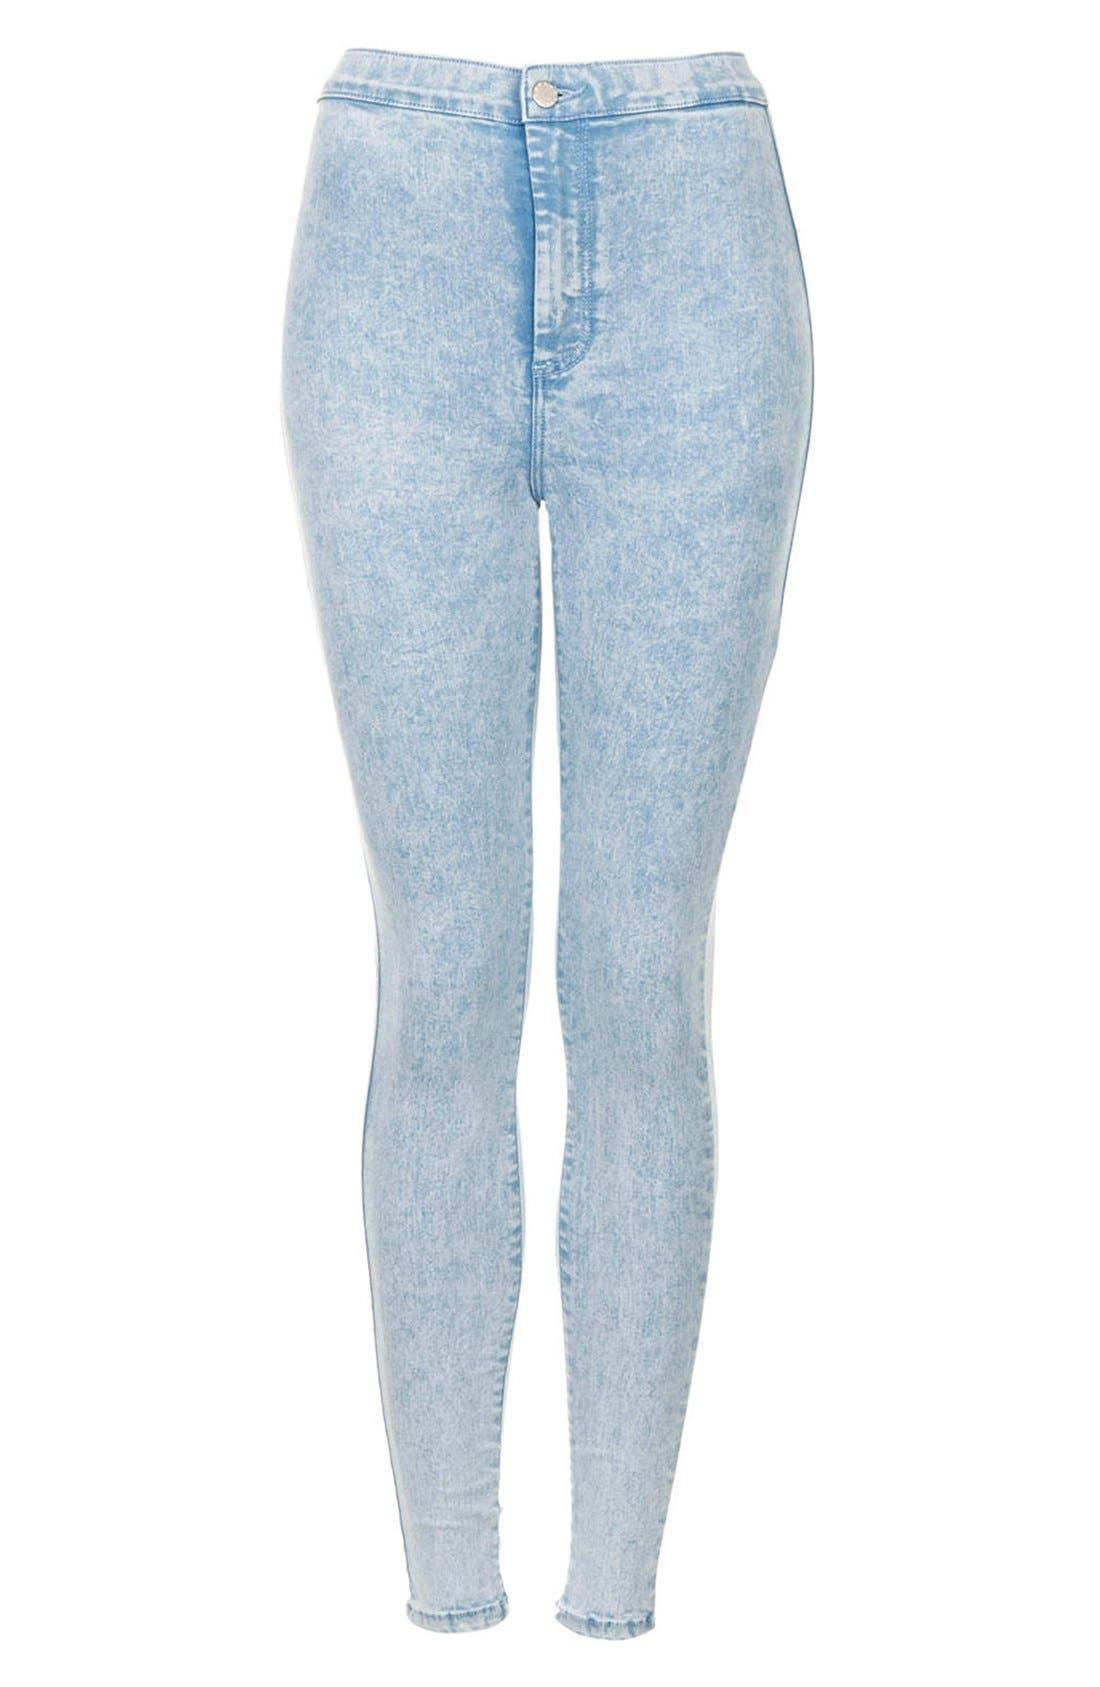 Alternate Image 3  - Topshop Moto 'Joni' Acid Wash High Rise Skinny Jeans (Light) (Regular & Short)